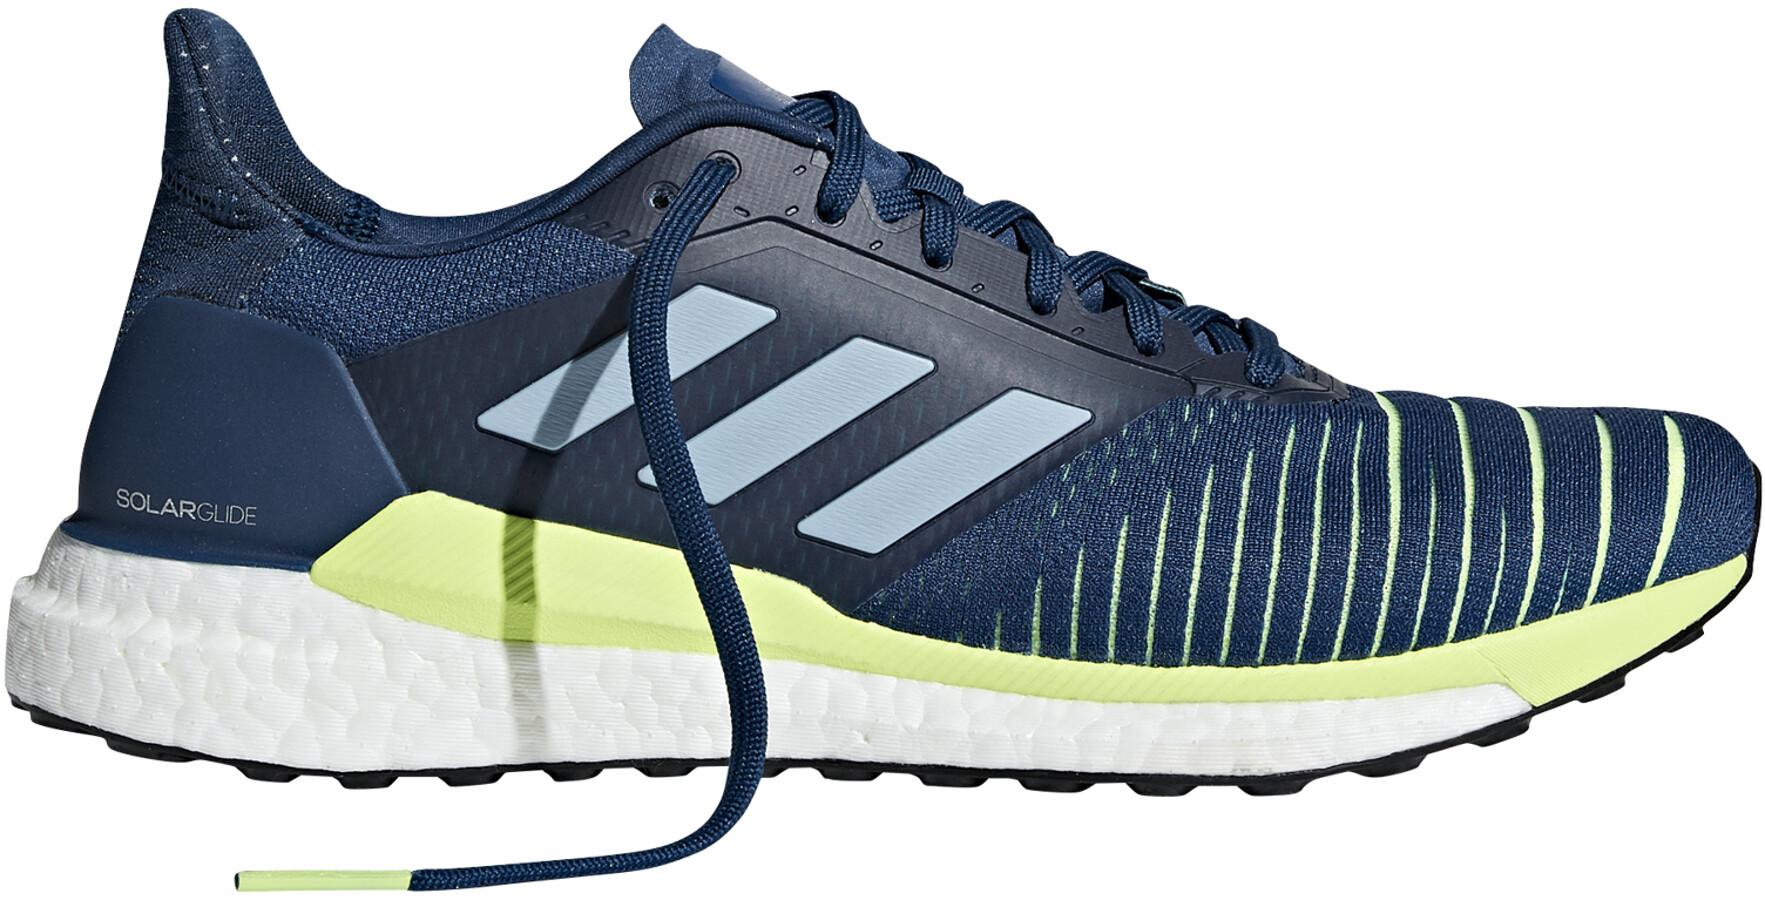 best service 3a2d6 9b30e adidas Solar Glide - Zapatillas running Hombre - azul